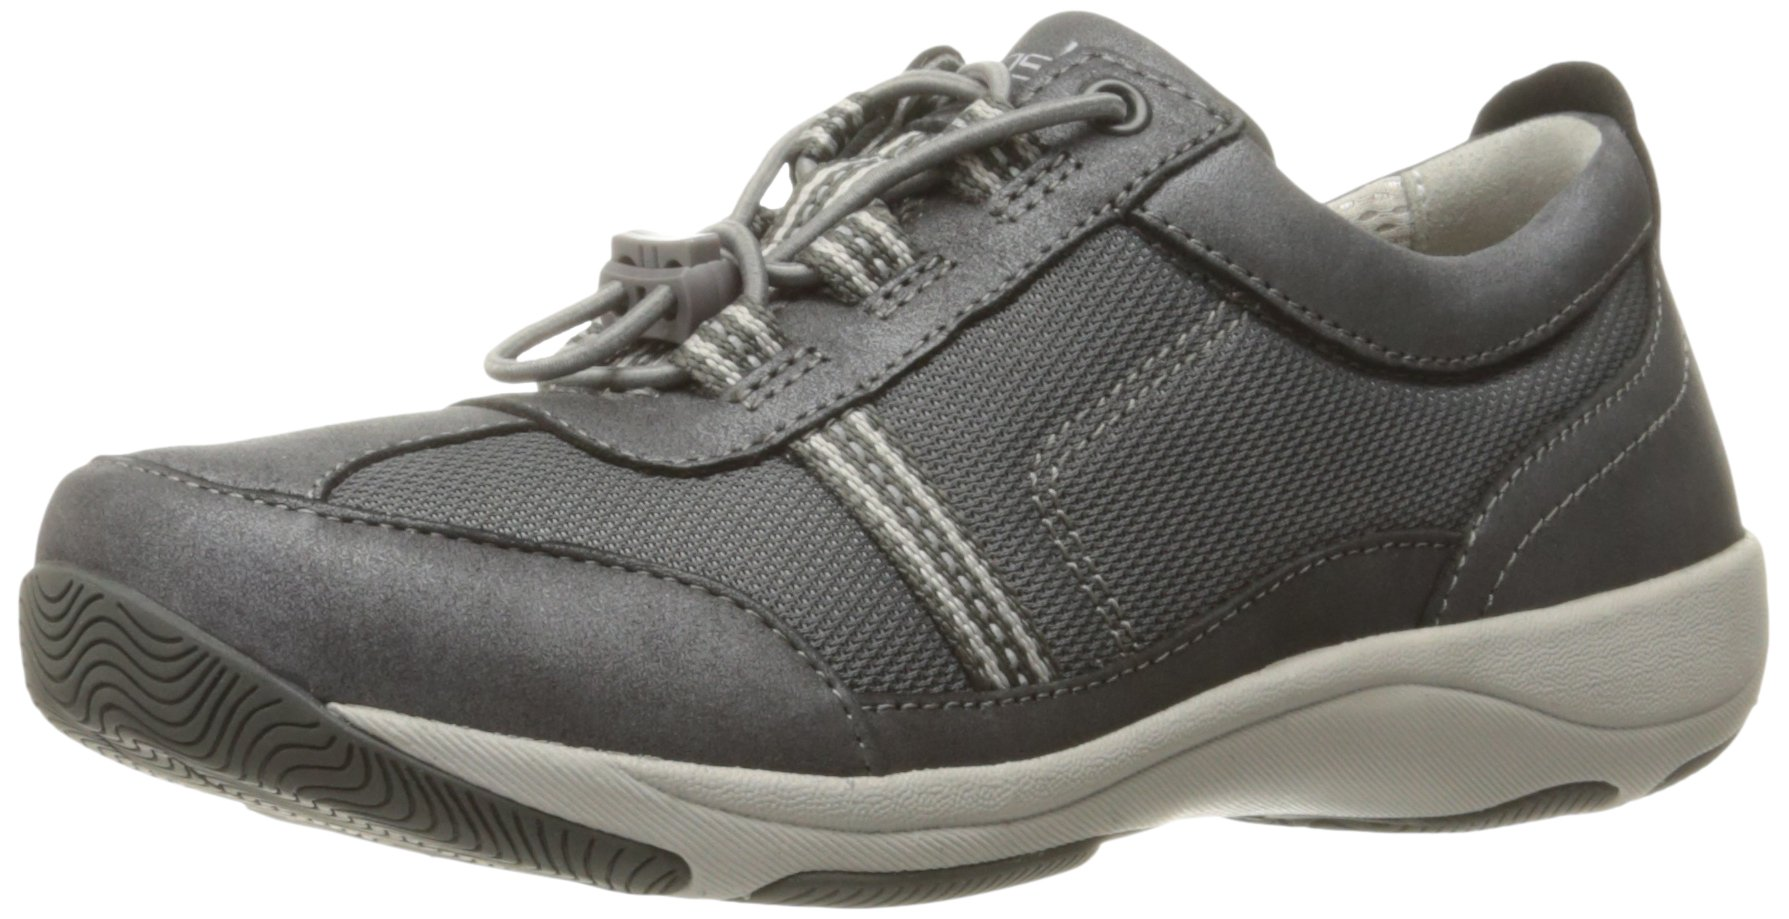 Dansko Women's Helen Fashion Sneaker, Charcoal/Metallic Suede, 38 EU/7.5-8 M US